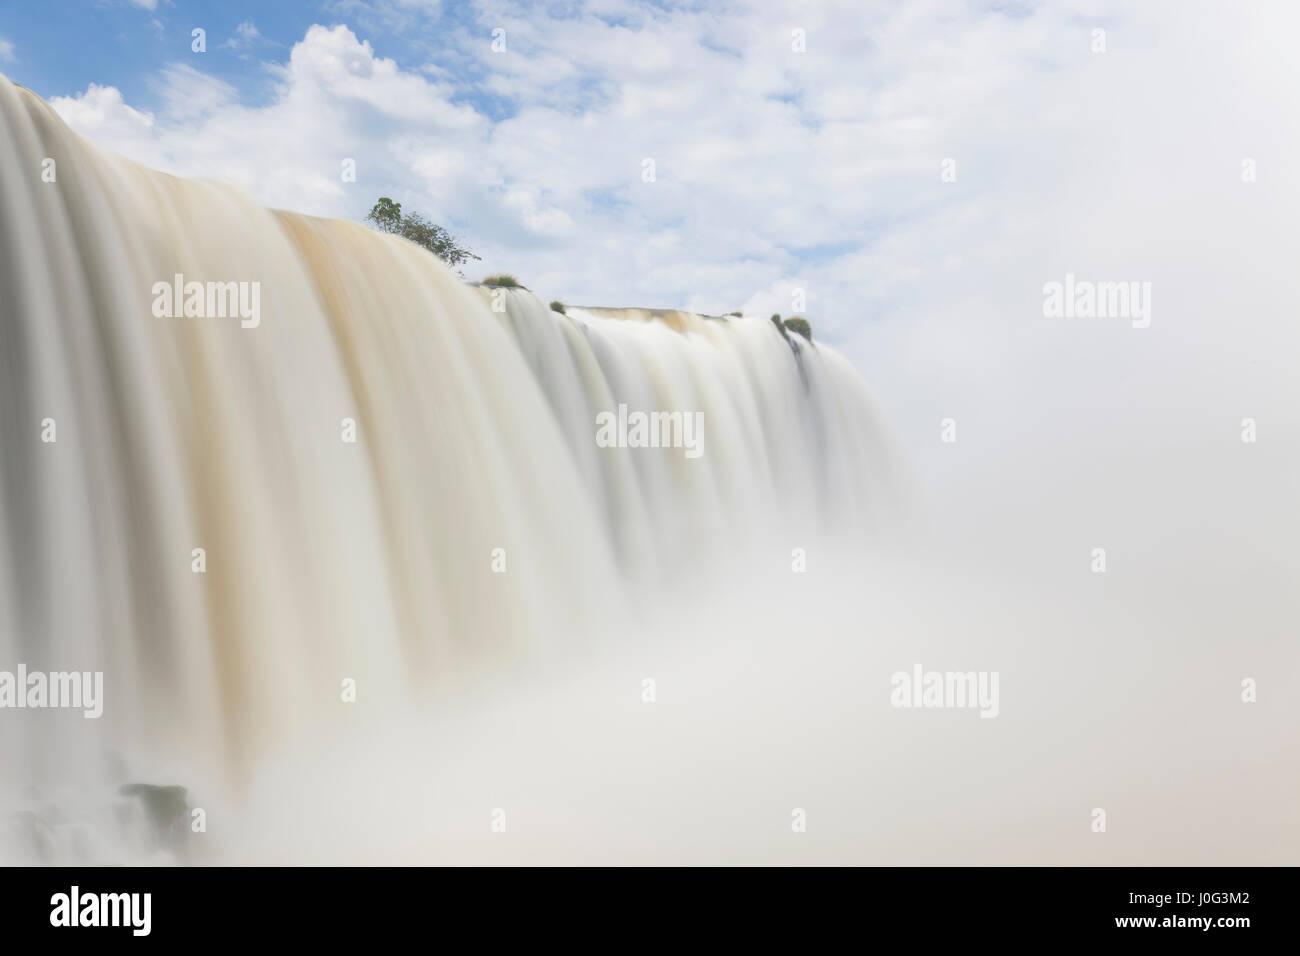 Iguacu (Iguazu) Falls, Cataratta Foz do Iguacu, Parana, Iguazu National Park, Brazil Stock Photo